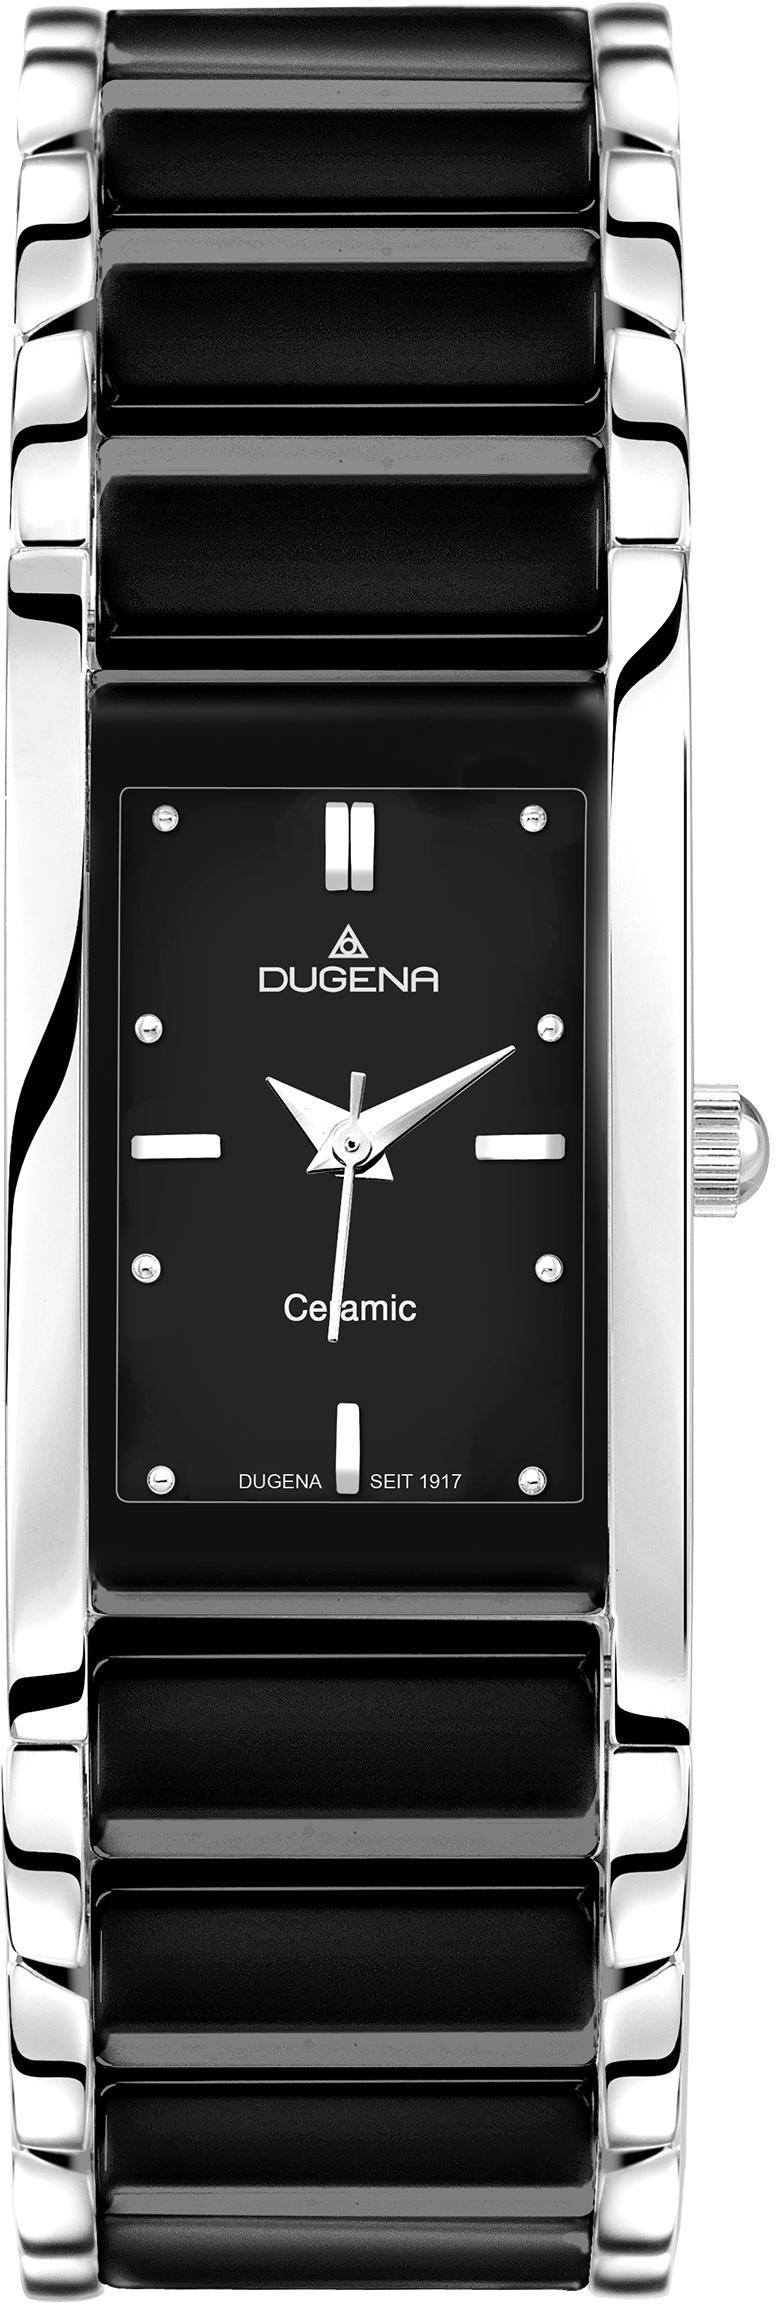 Dugena Quarzuhr Quadra Ceramica, 4460507 günstig online kaufen